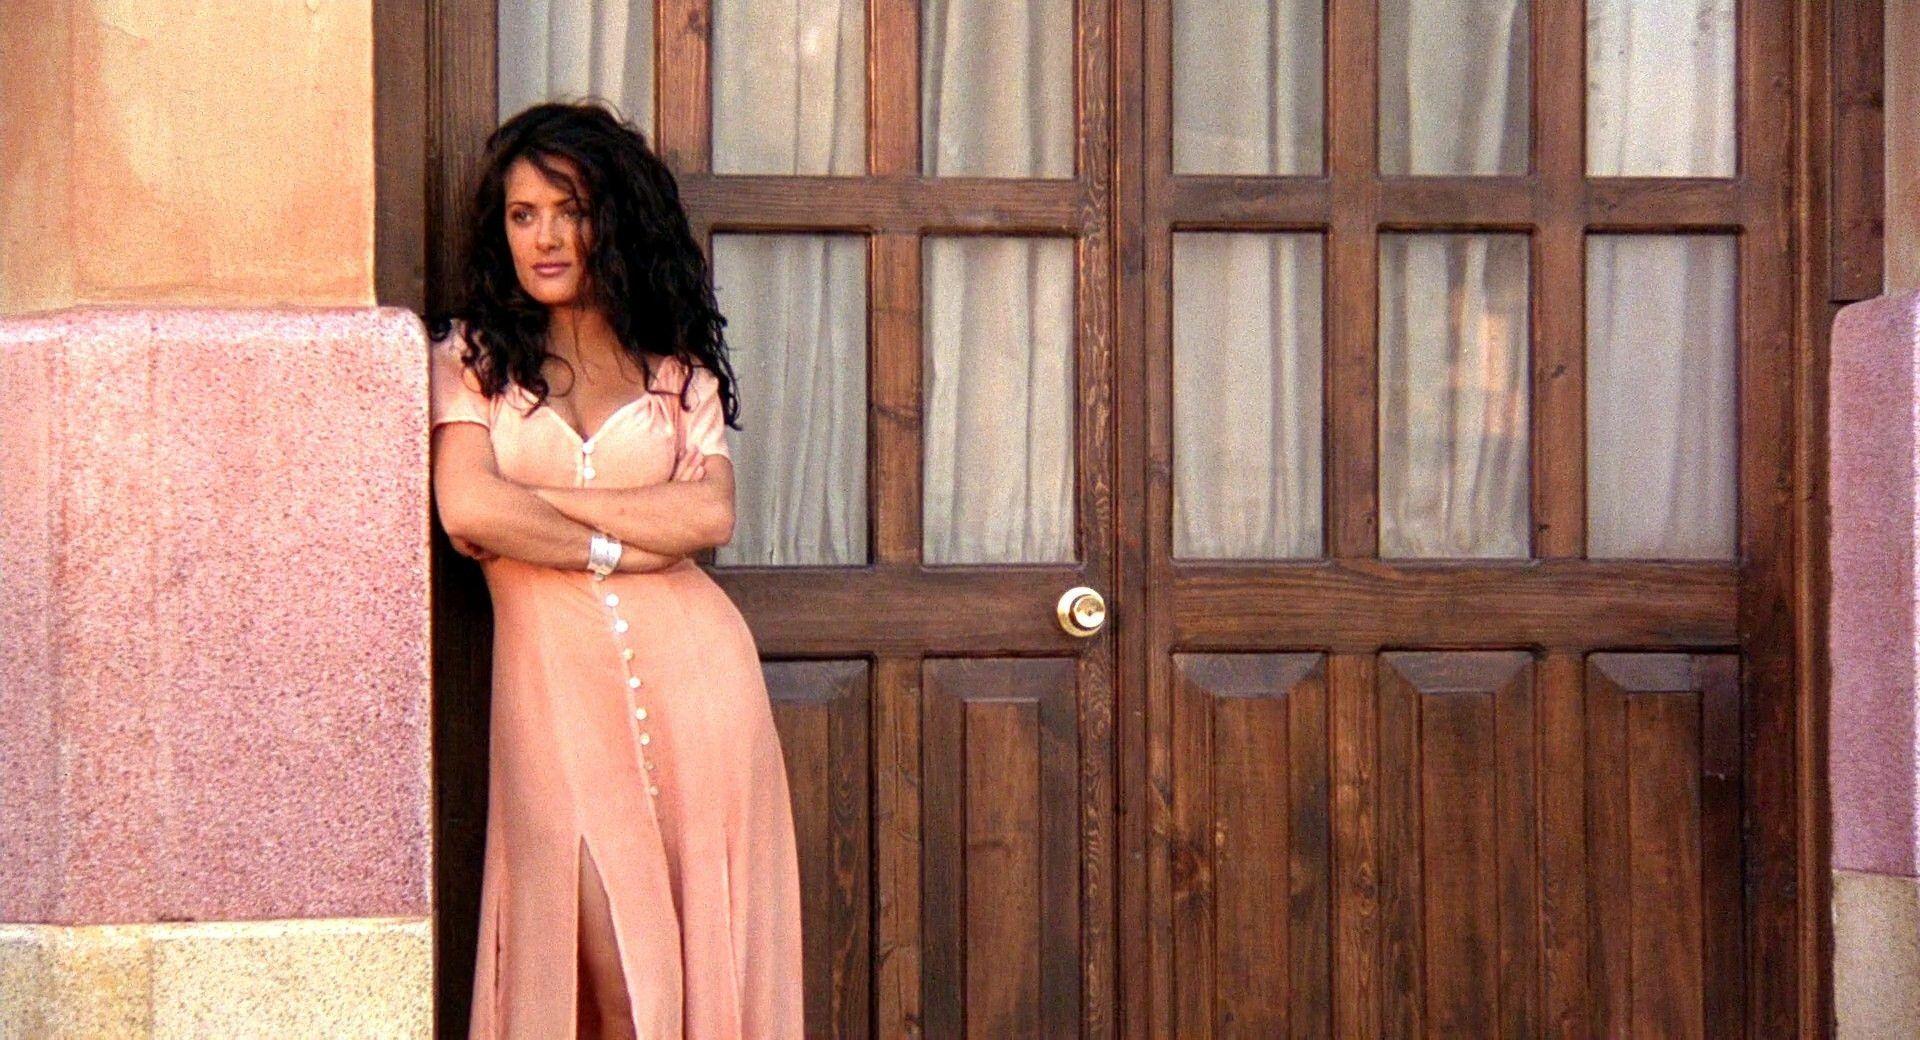 Pin By Michael Reinert On Selma Hayek Salma Hayek Salma Hayek Desperado Maxi Dress